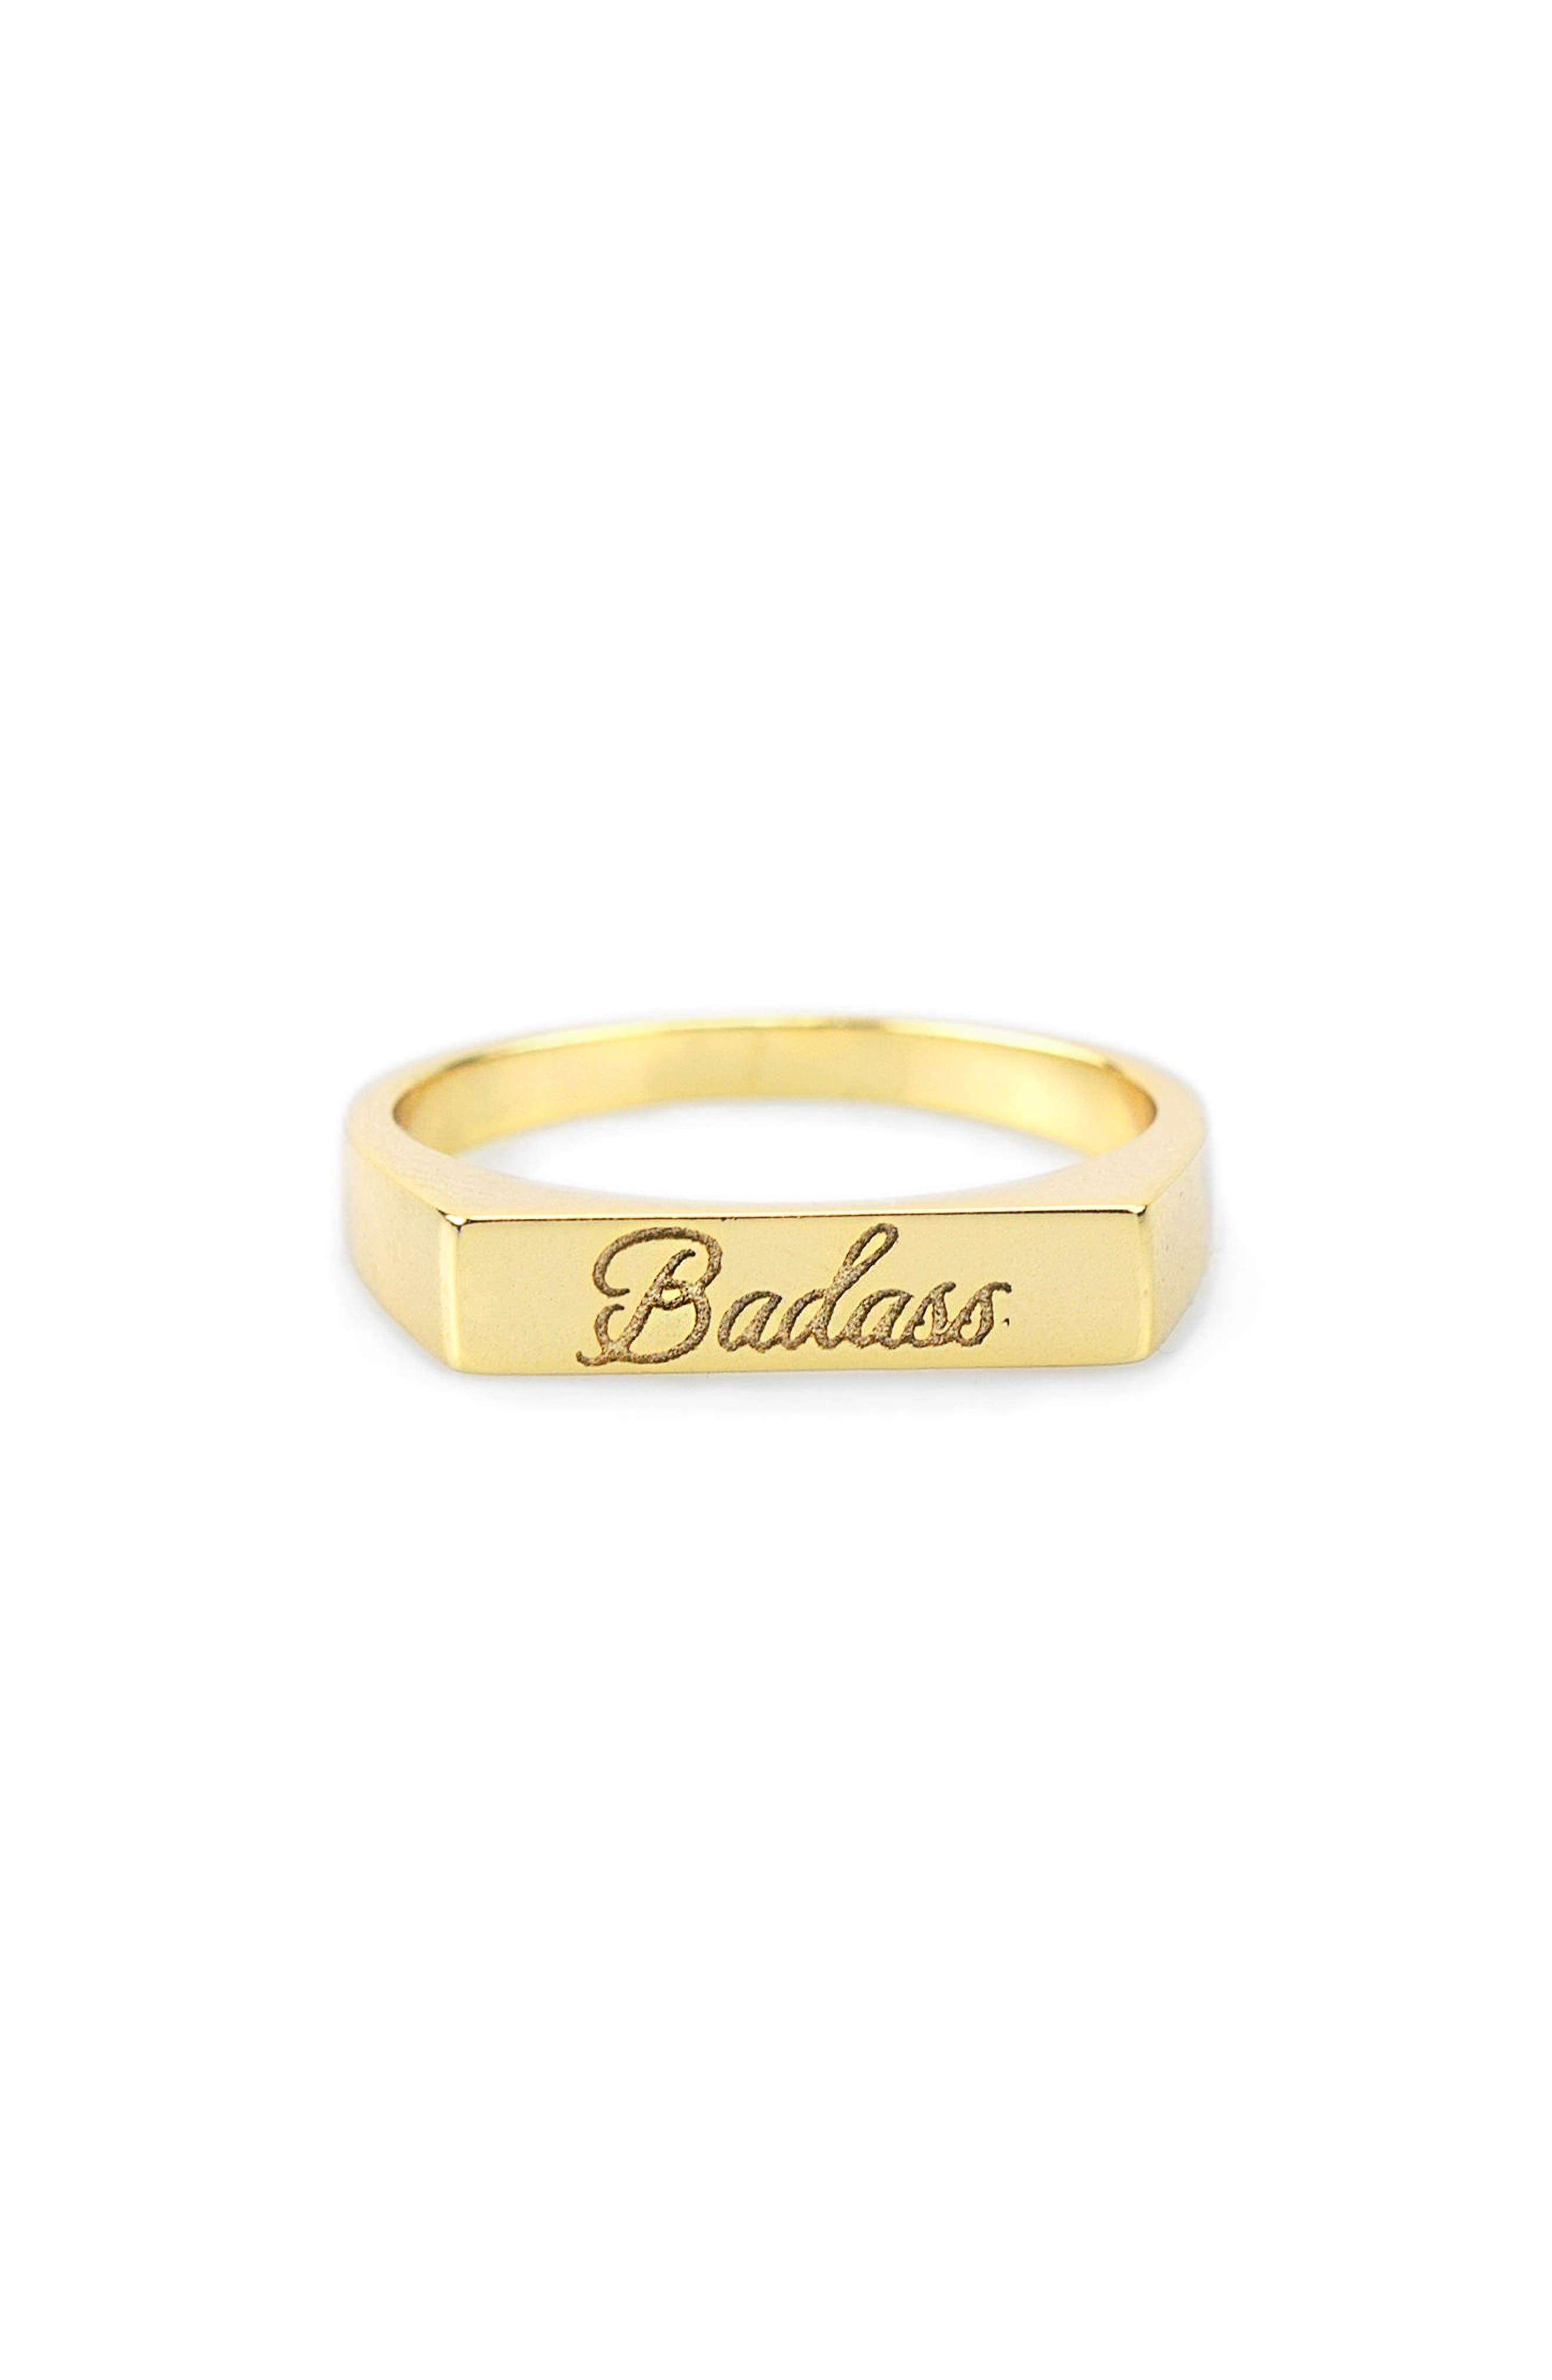 Alternate Image 1 Selected - Kris Nations Engraved Ring